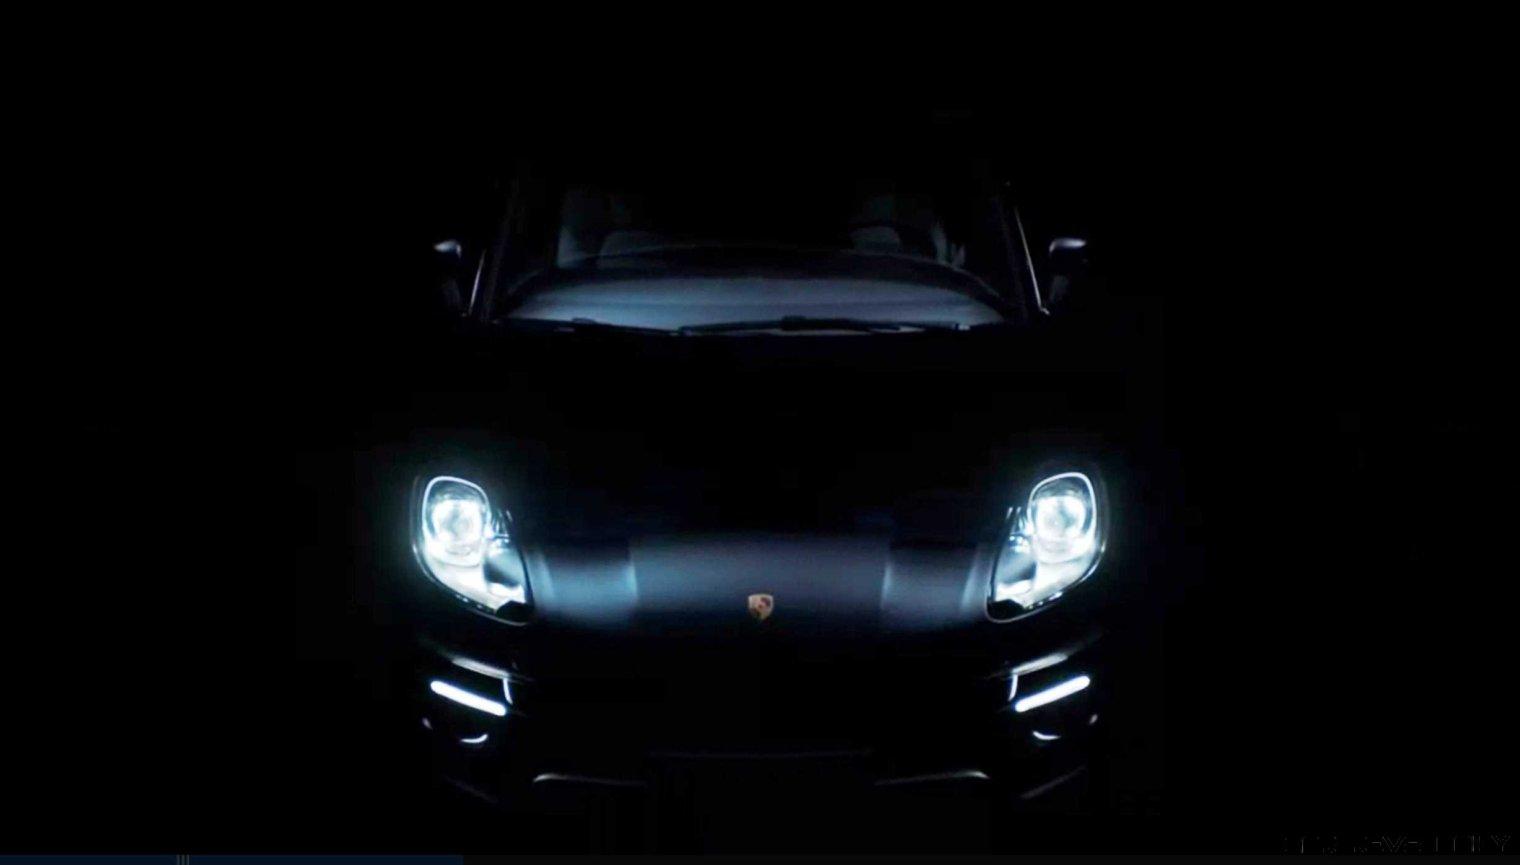 2015 Porsche Macan - Latest Images - CarRevsDaily.com 34